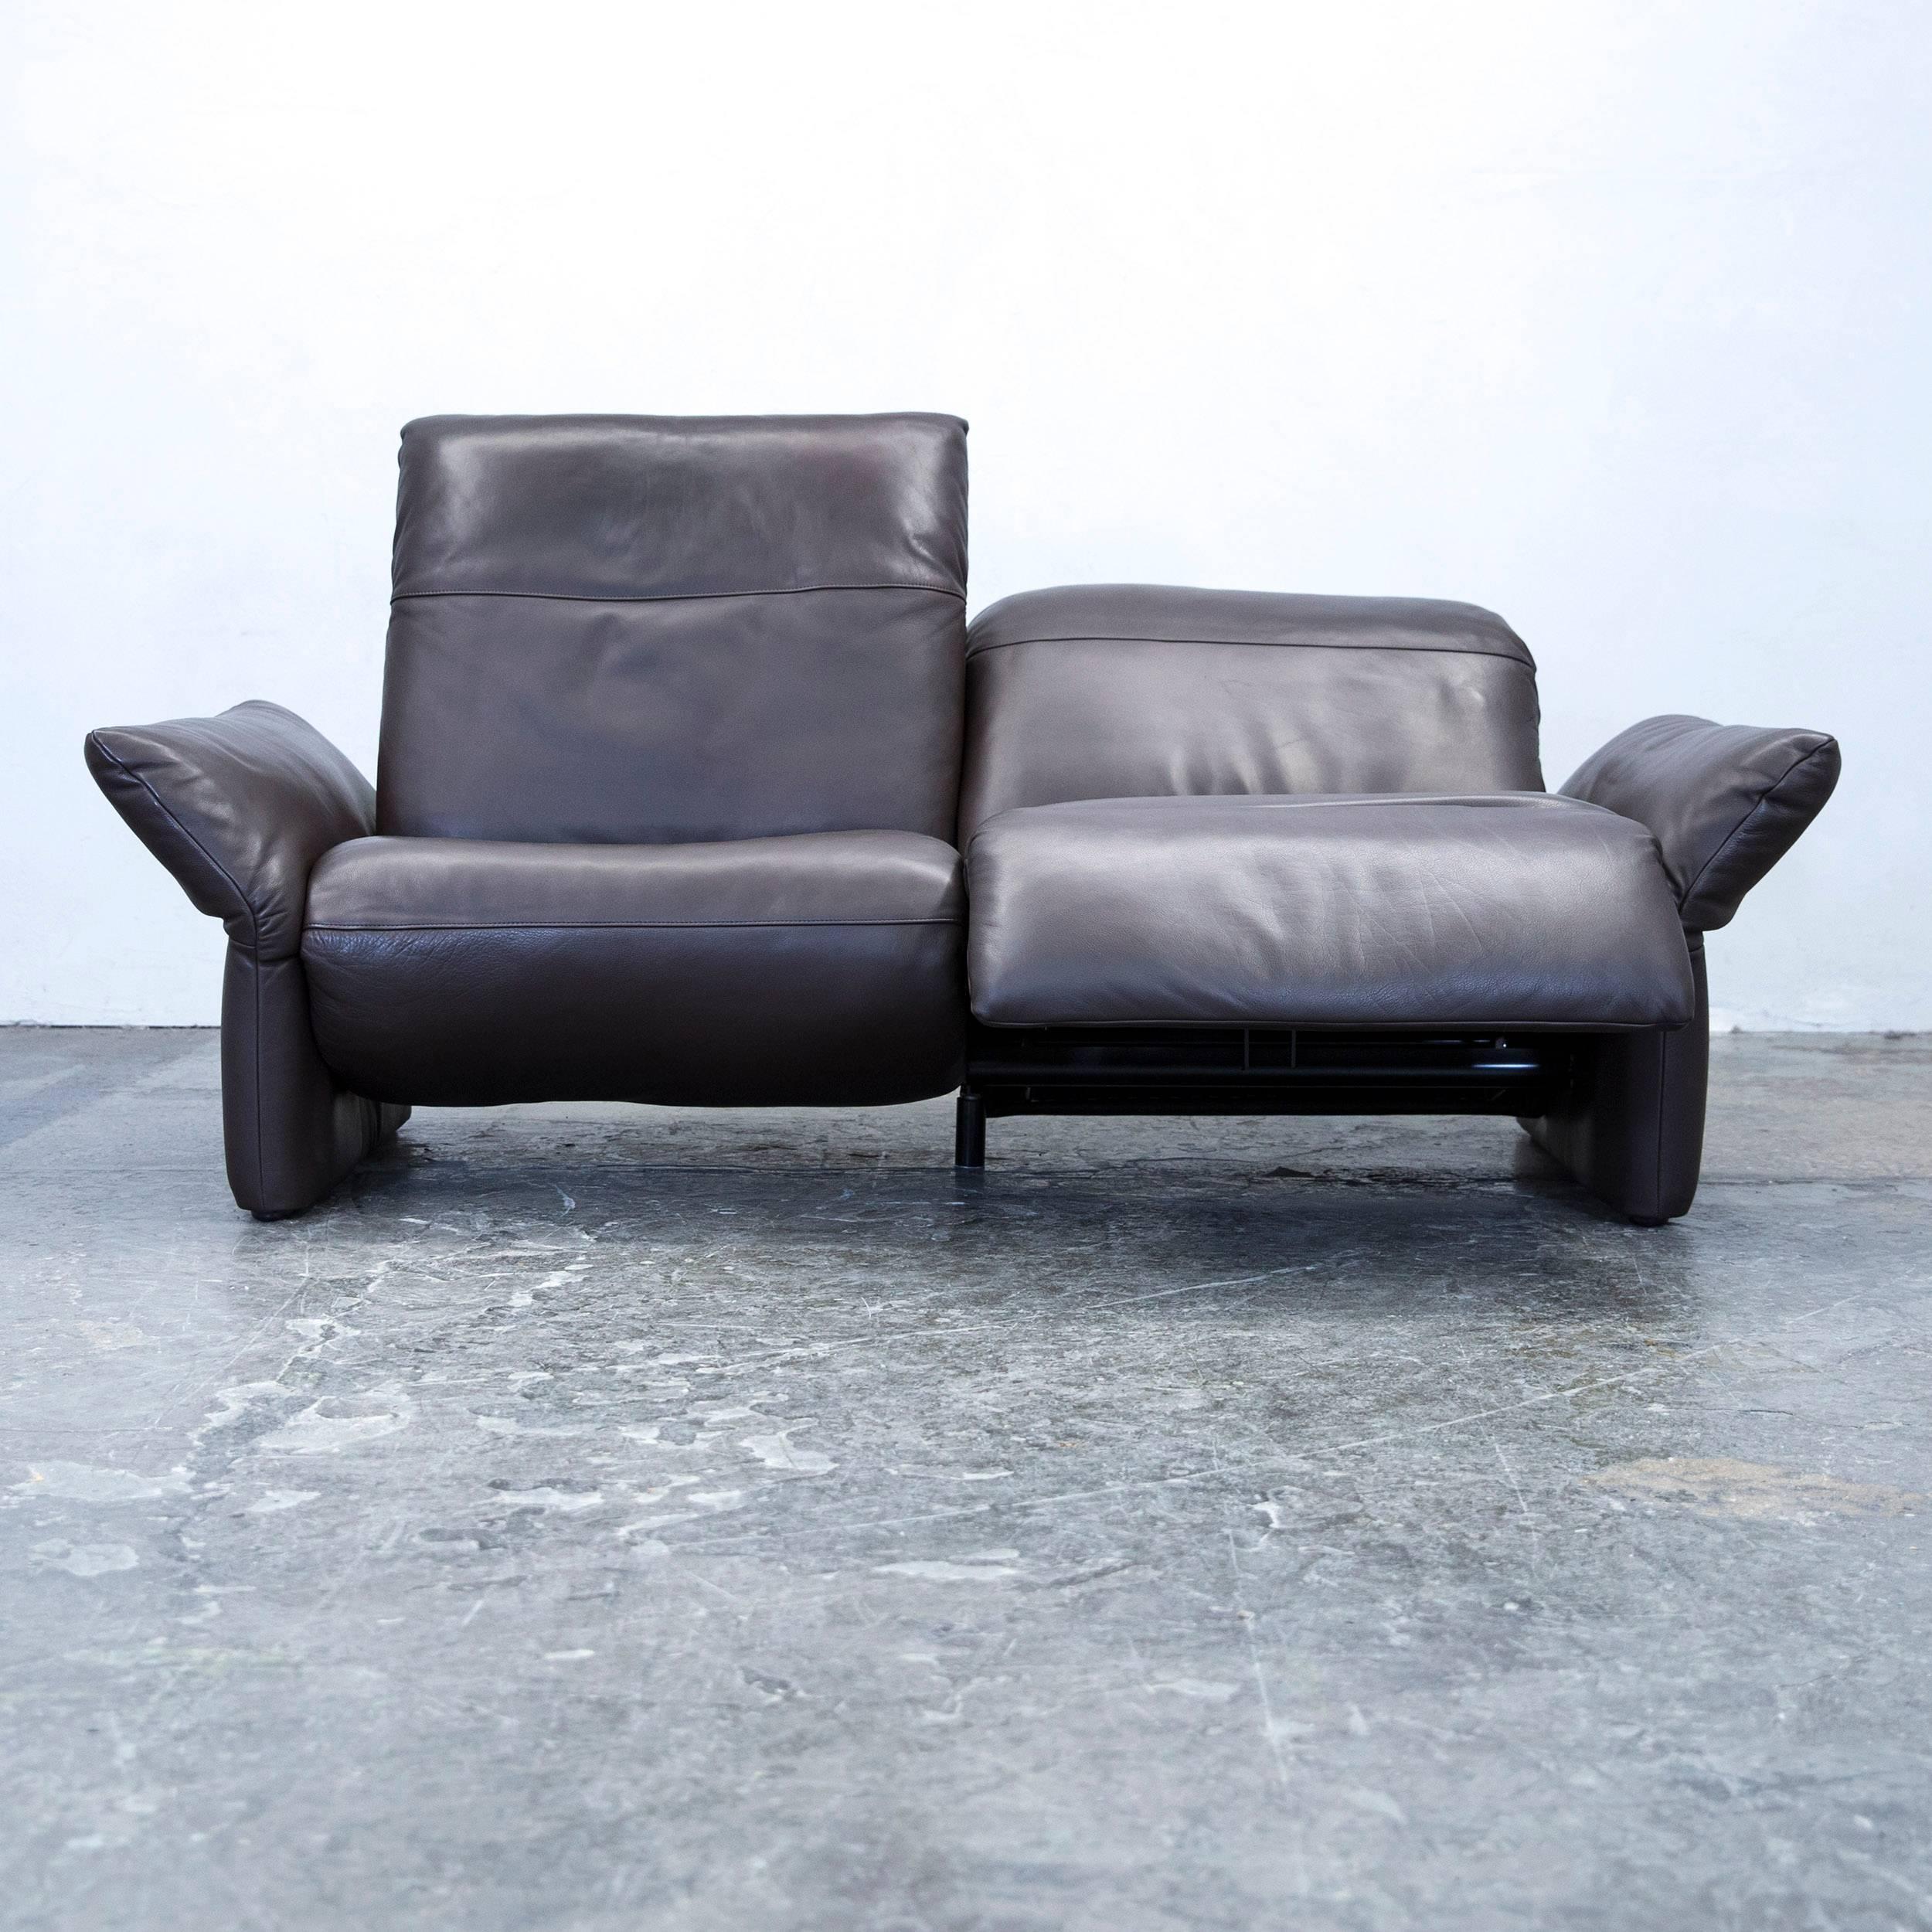 Brown Colored Original Koinor Elena Designer Leather Sofa Set, In A  Minimalistic And Modern Design